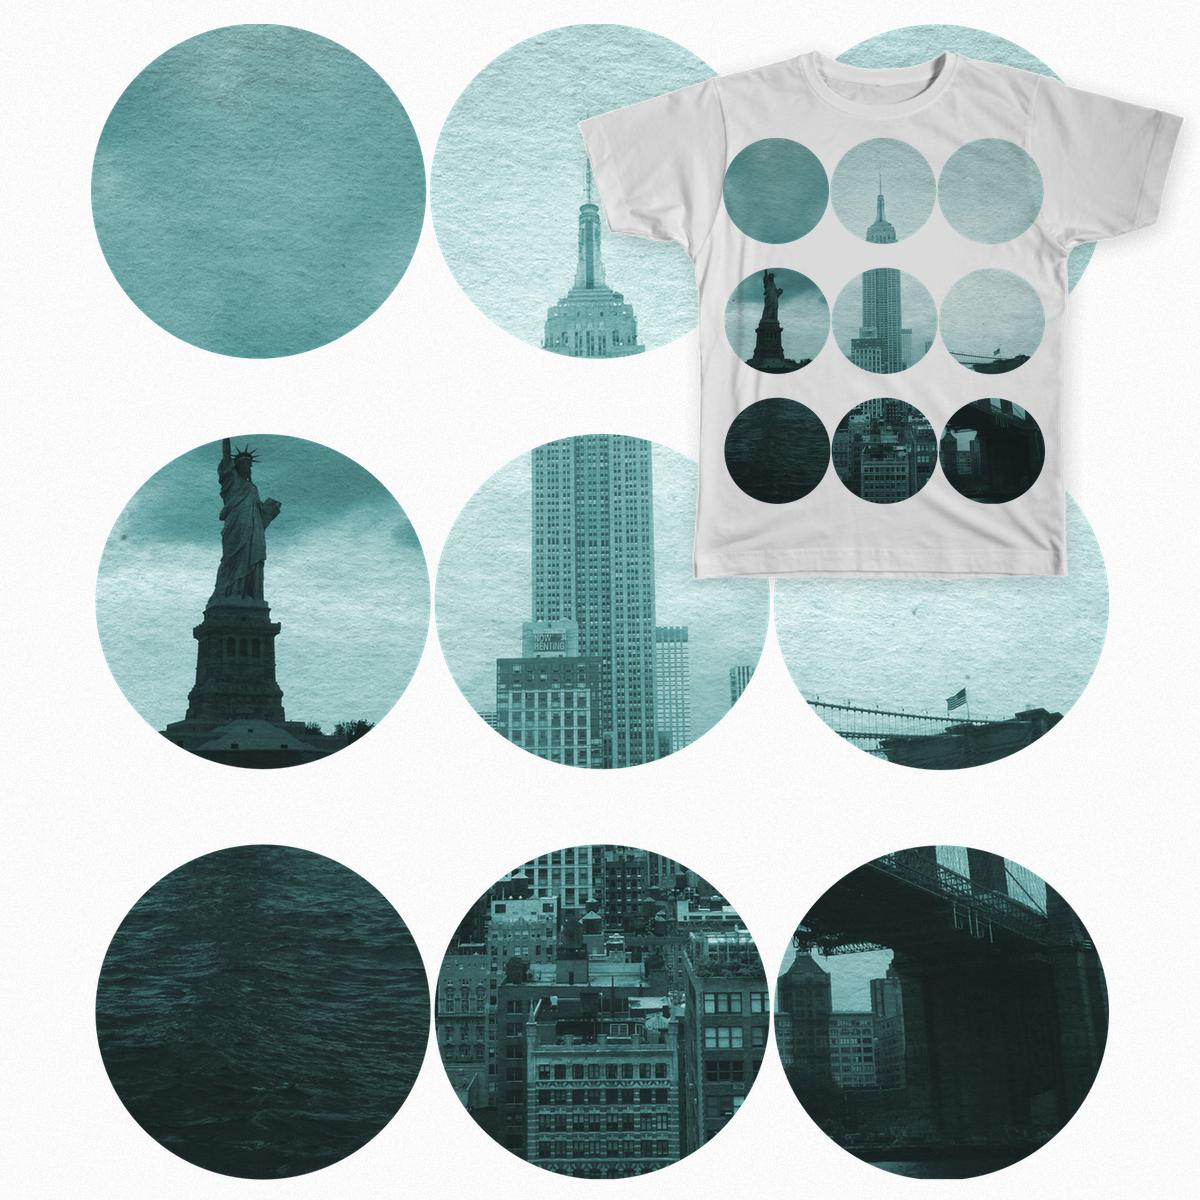 NYC Blues by GracieHB on Threadless